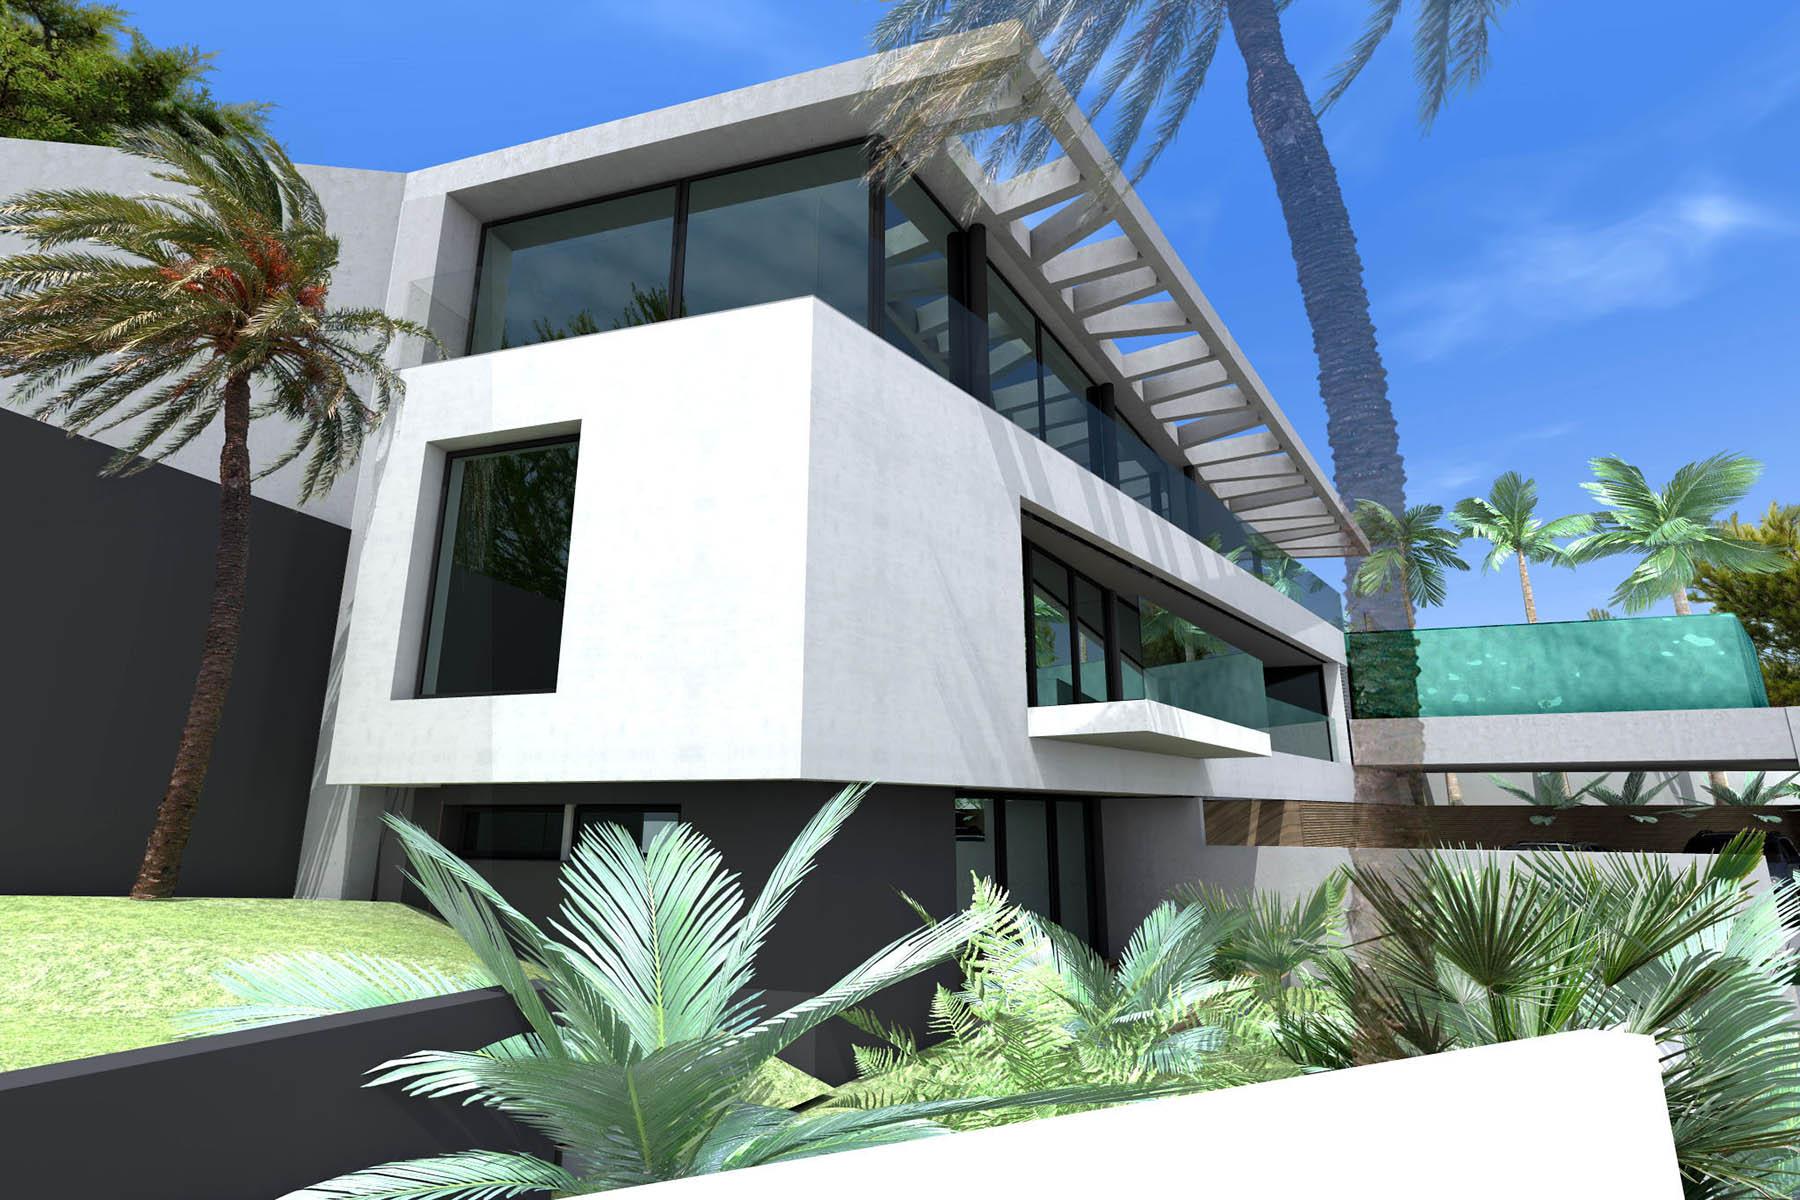 Villa-architecte-3.jpg